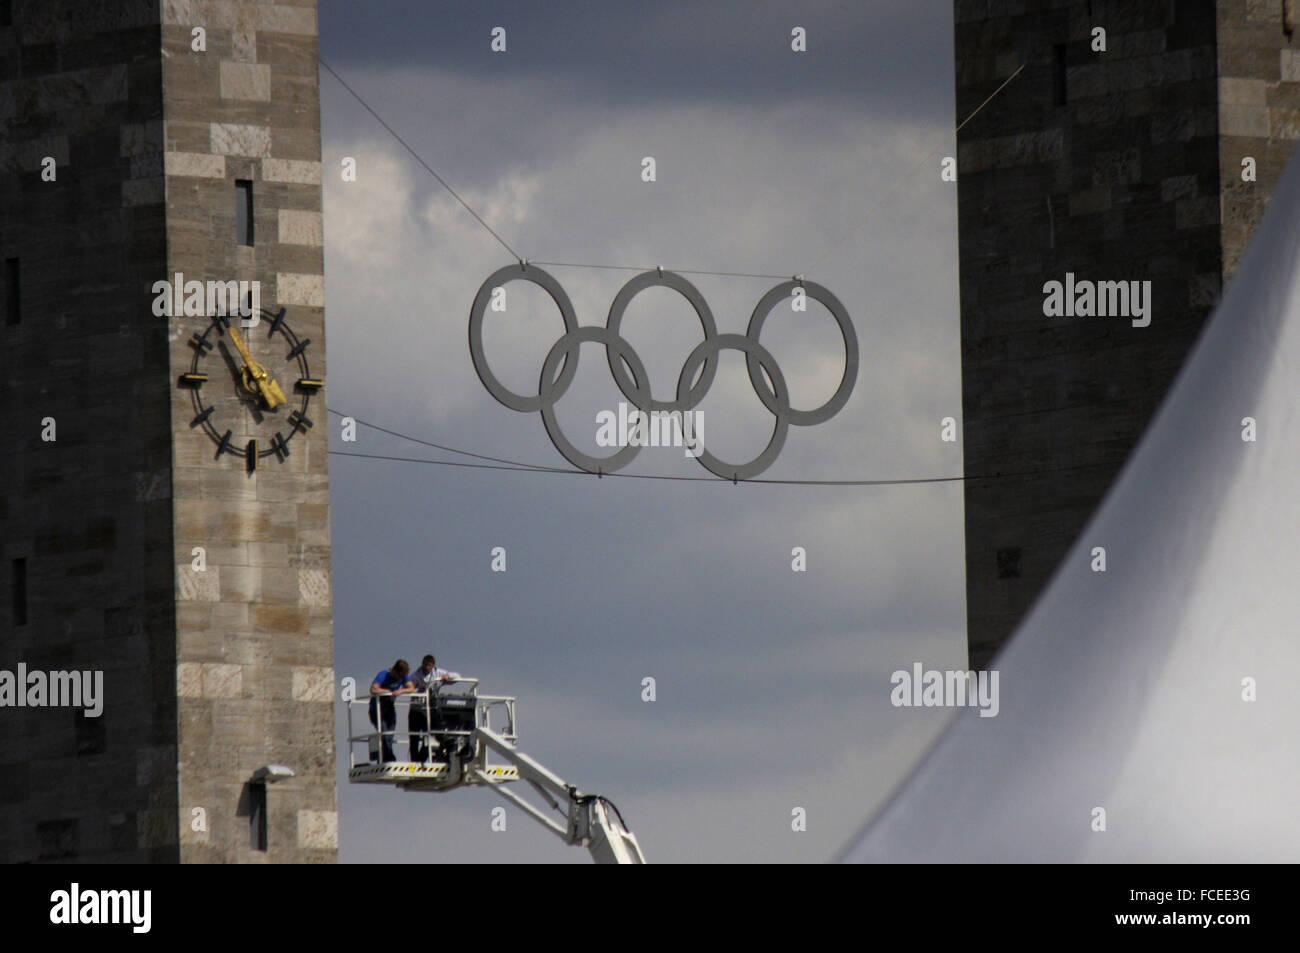 olympische Ringe am Olympiastadion, Berlin. - Stock Image